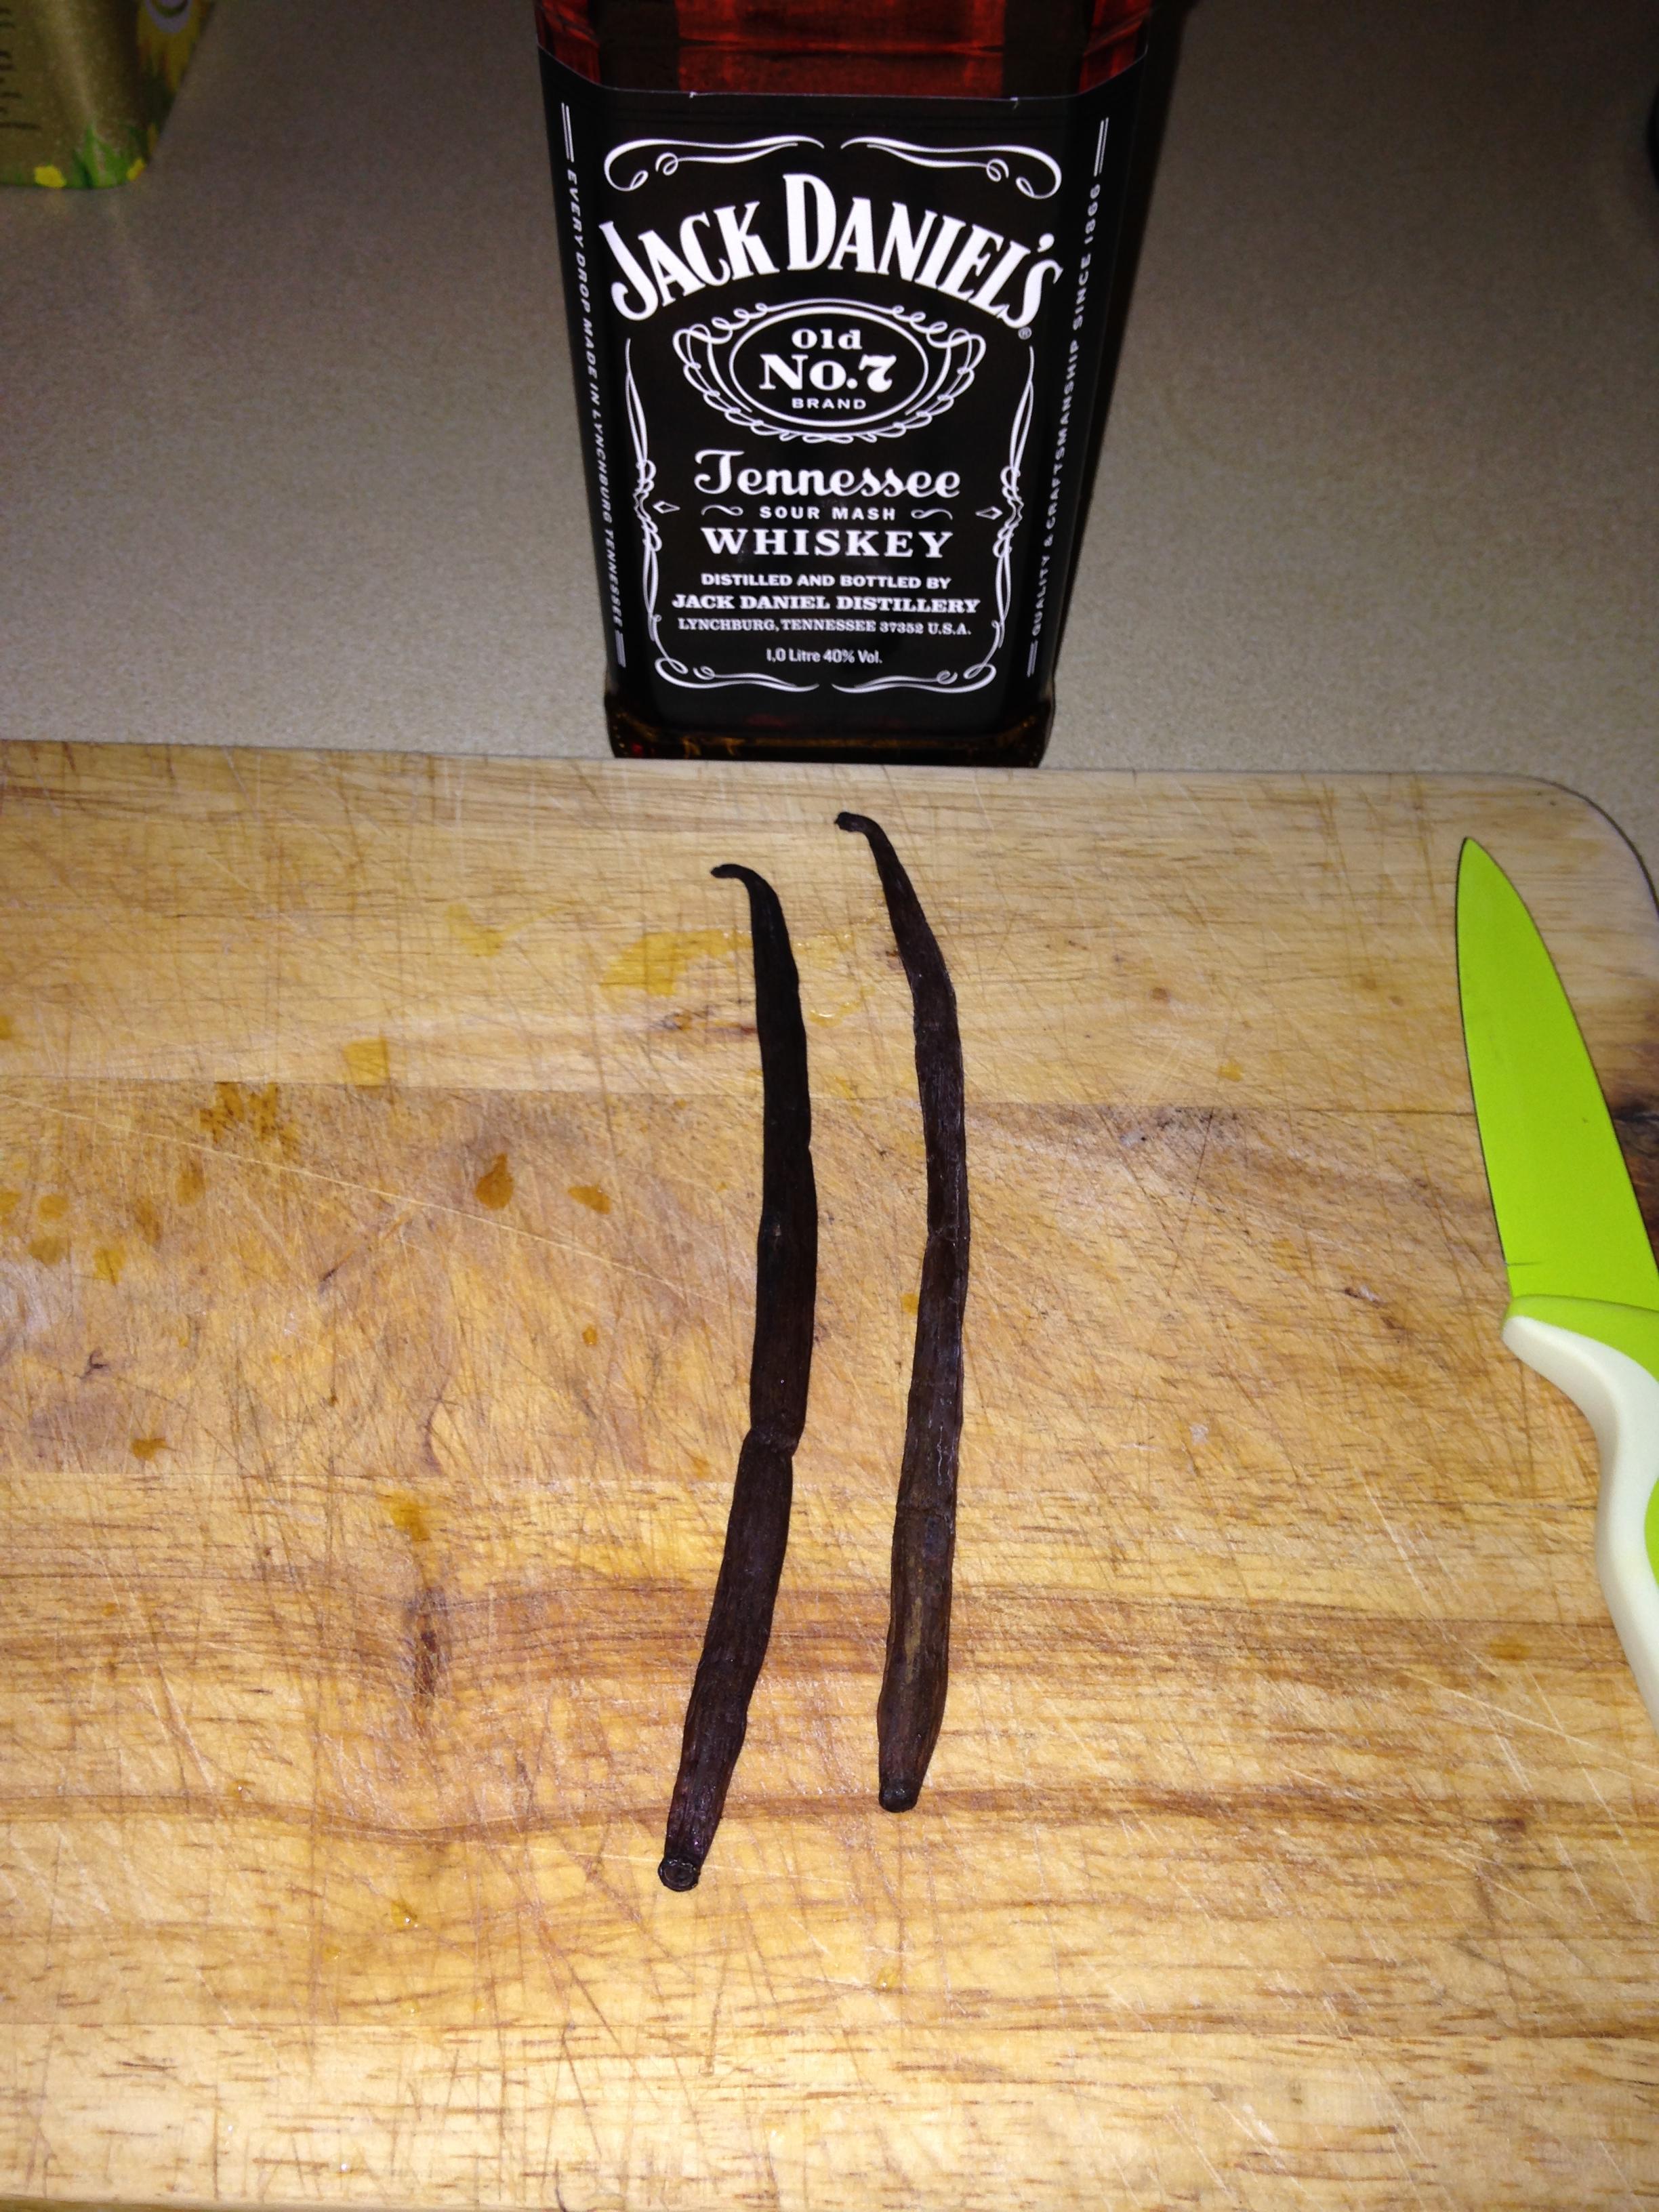 Vanilla Beans and Jack Daniels